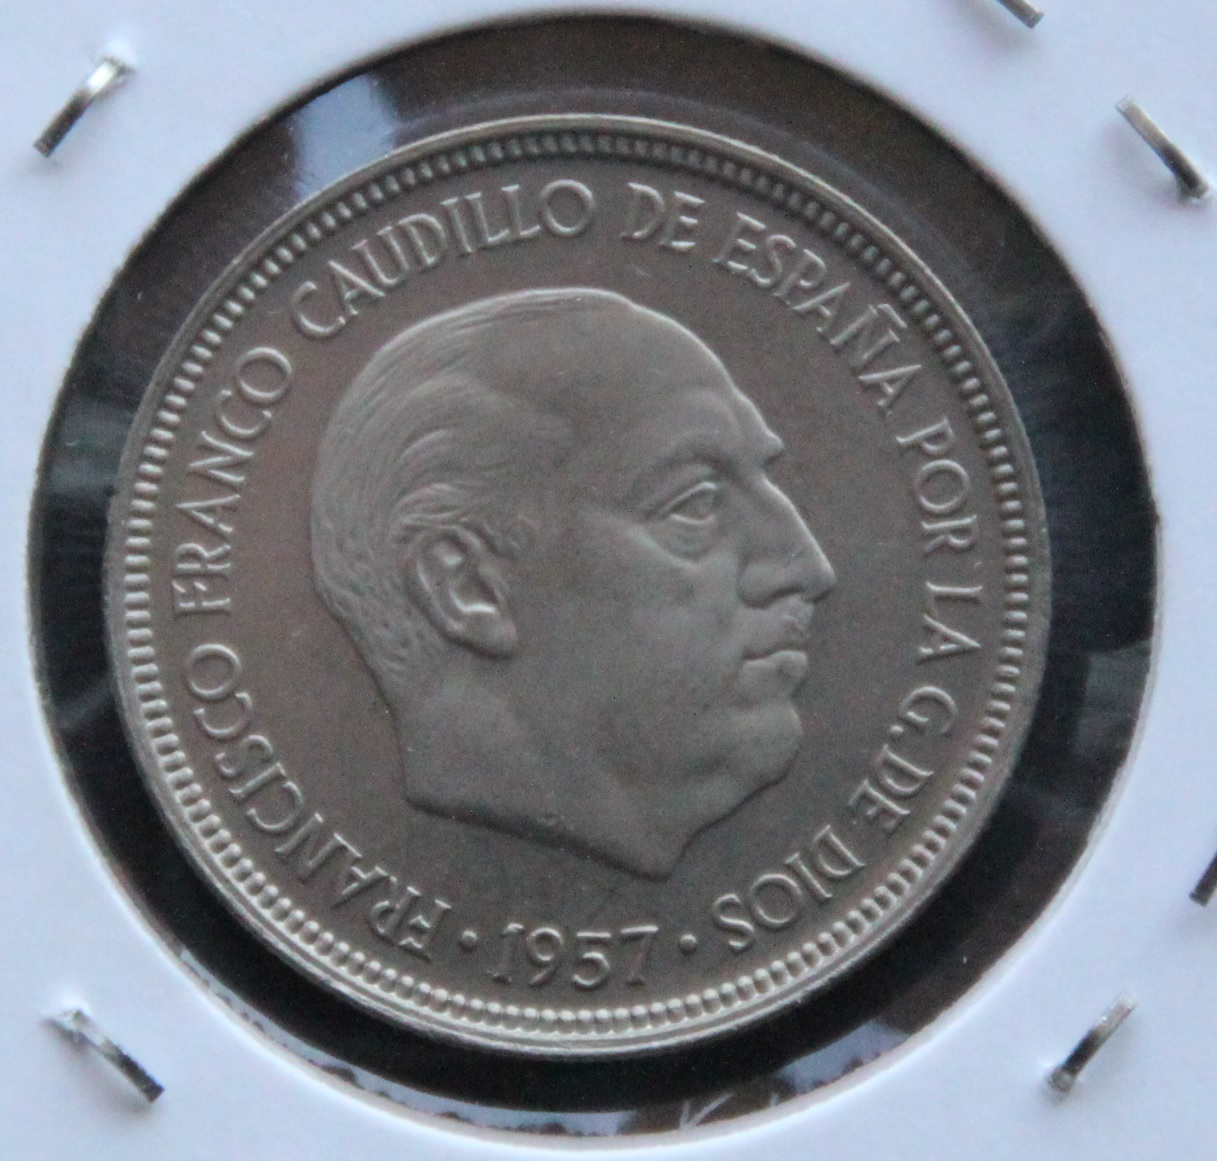 5 pesetas 1957 *75 PROOF Anverso